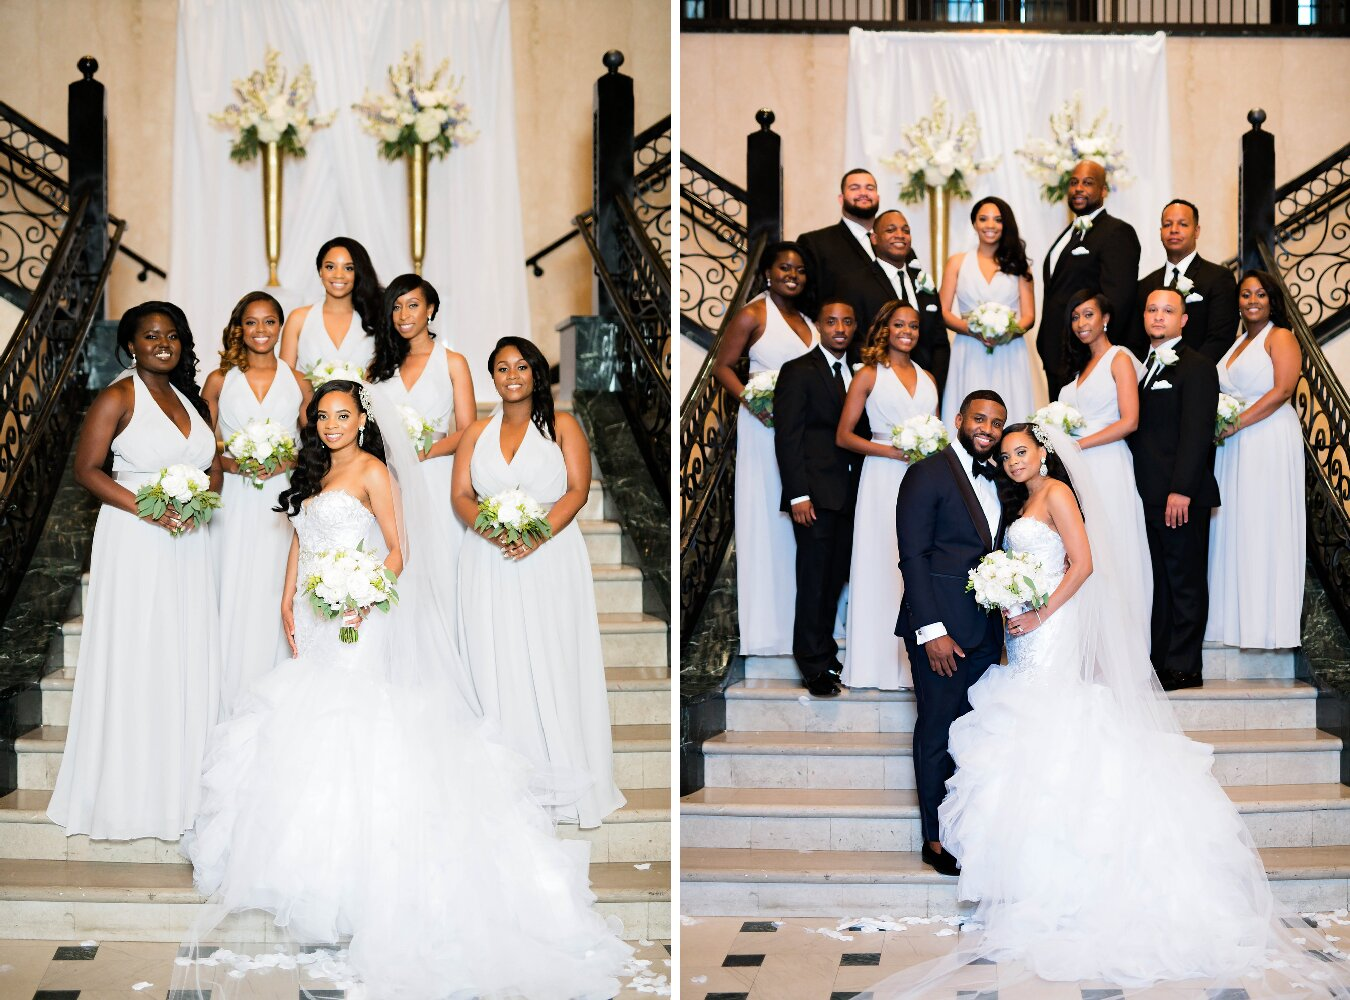 Tulsa Wedding- Pharris Photography- Darla + Quinton- Bridesmaids- Bridal Party